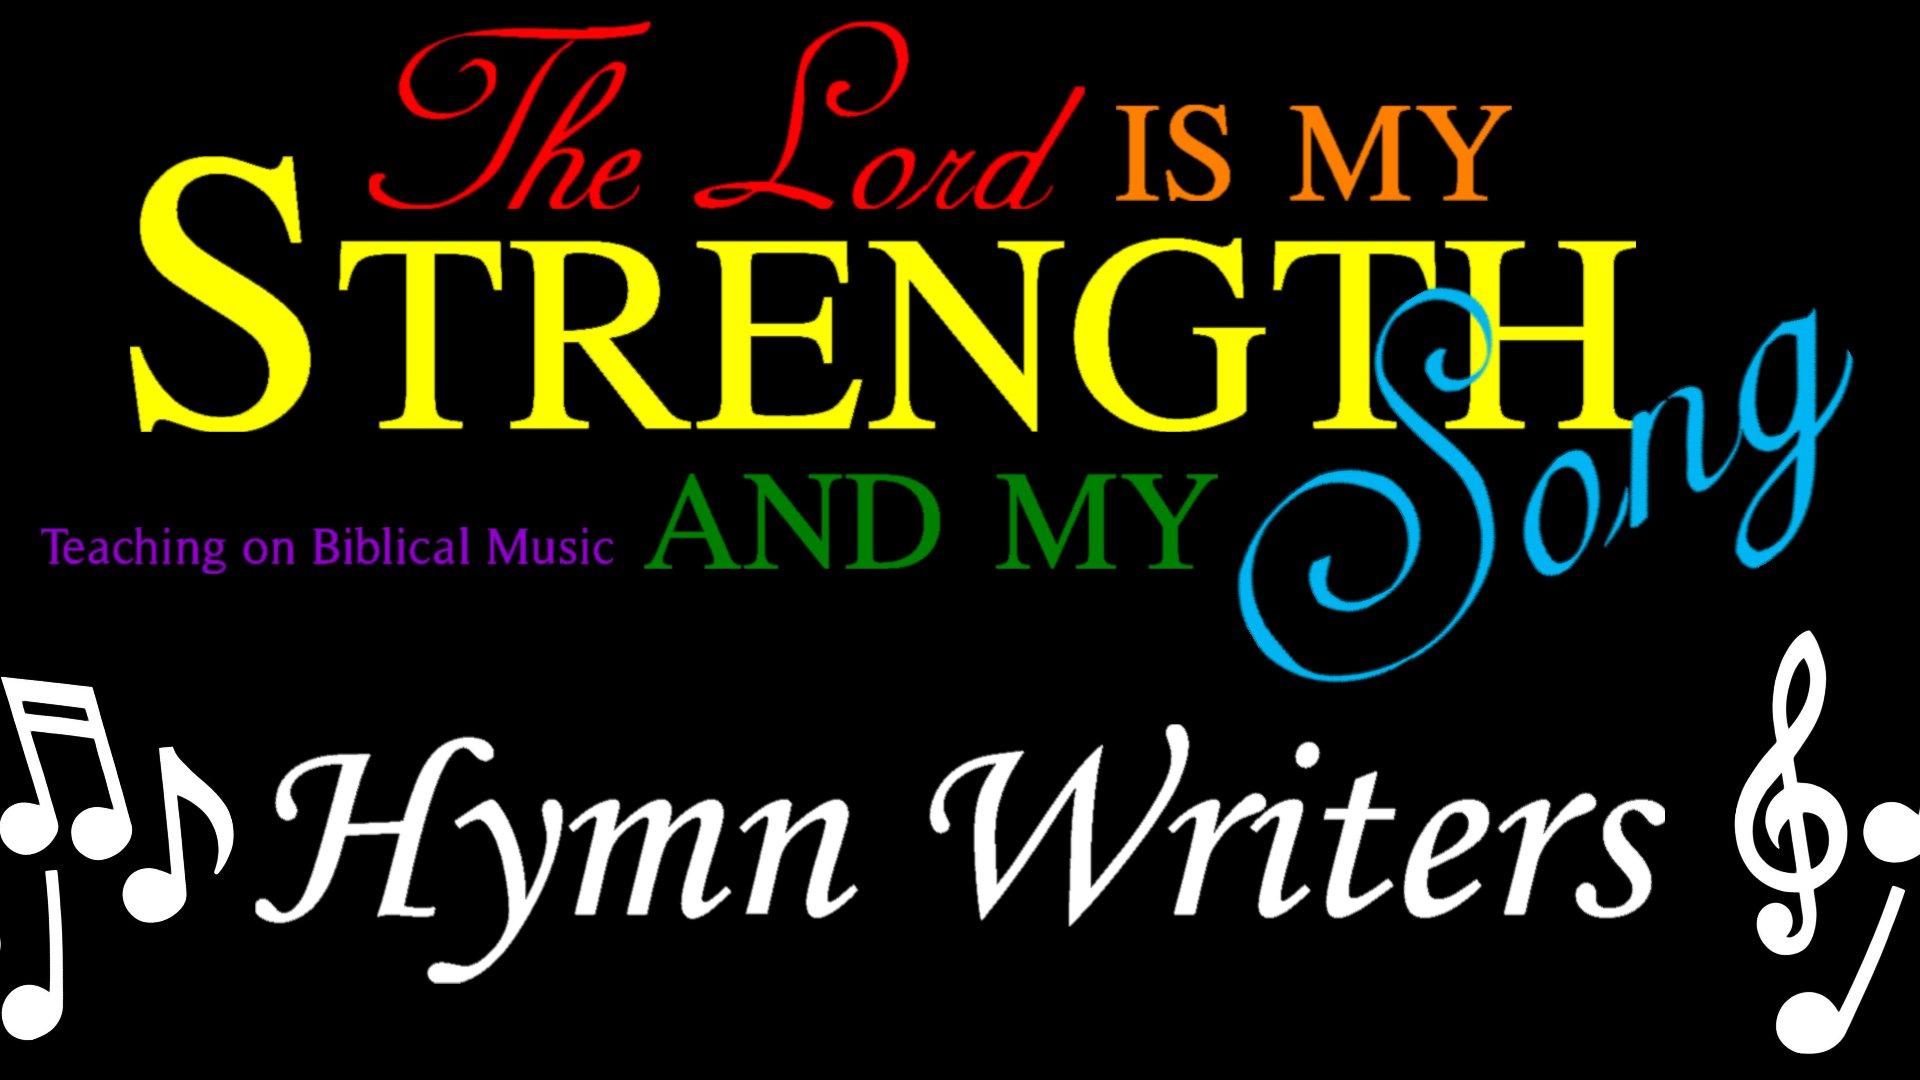 10 Hymn Writers